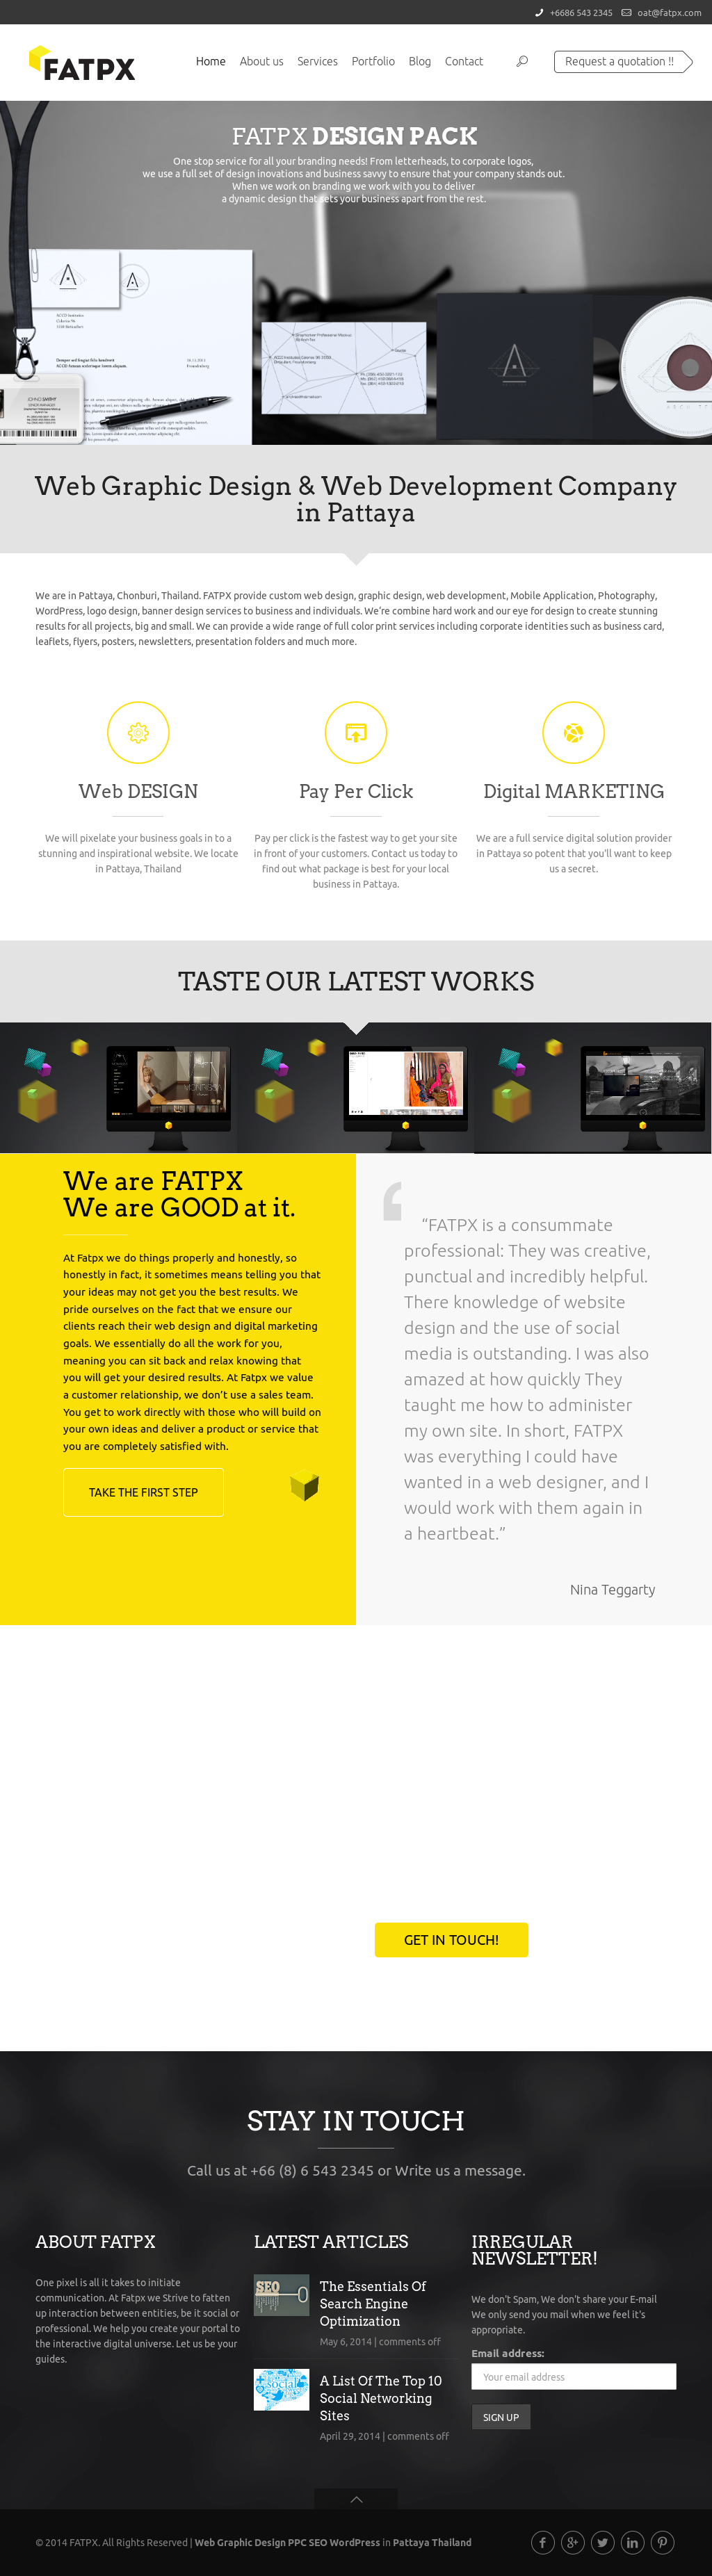 Web Design Digital Marketing In Pattaya Thailand Fatpx Competitors